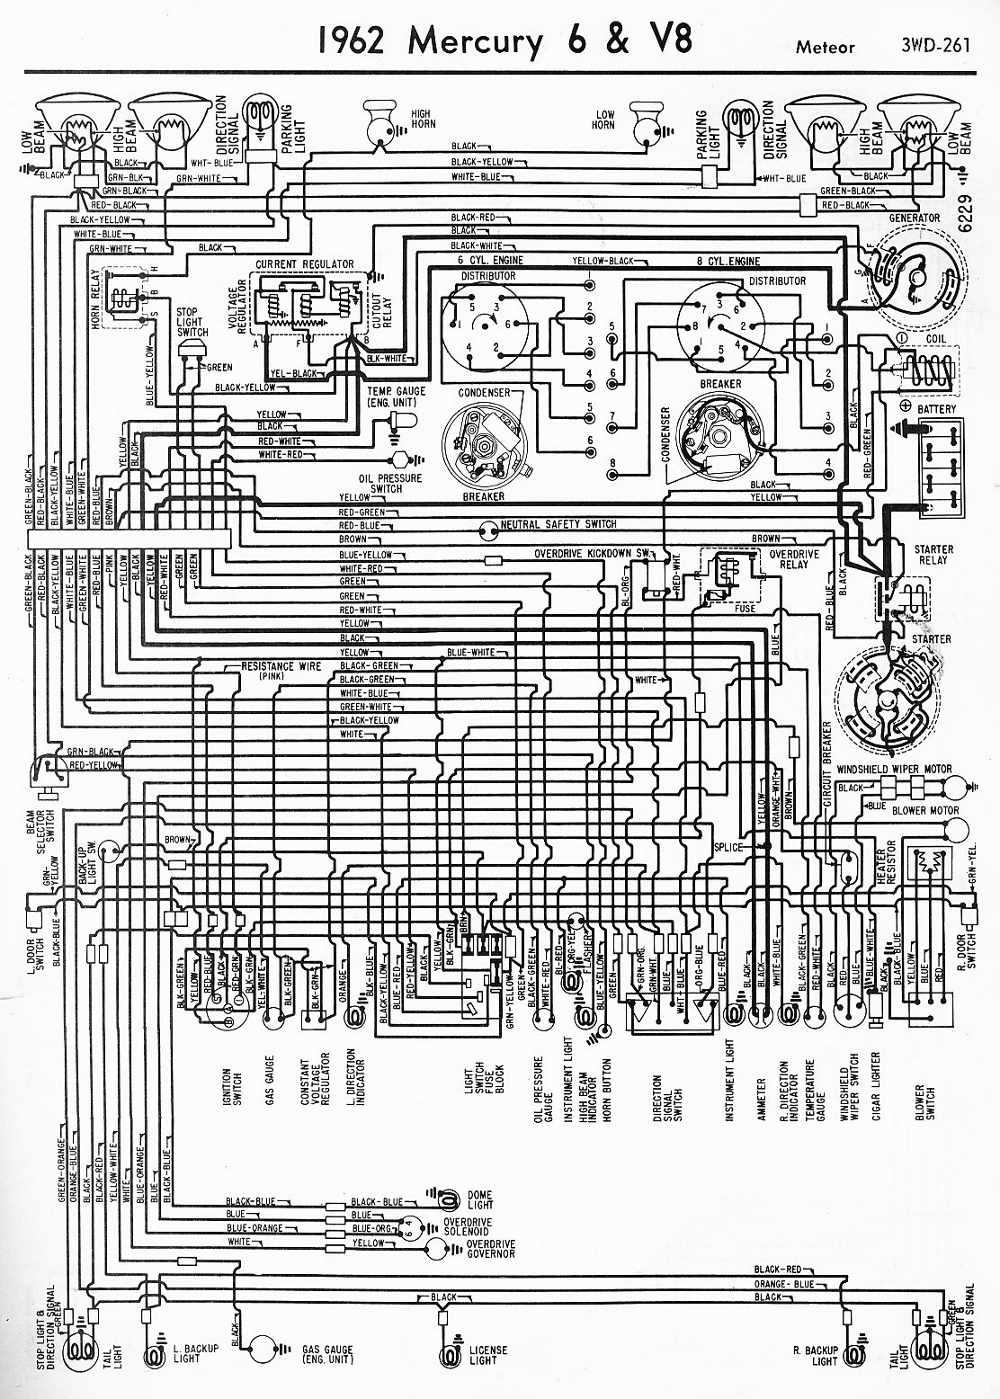 wiring diagrams of 1962 mercury 6 and v8 meteor?t=1508498122 mercury car manuals, wiring diagrams pdf & fault codes mercury milan wiring diagram at bayanpartner.co